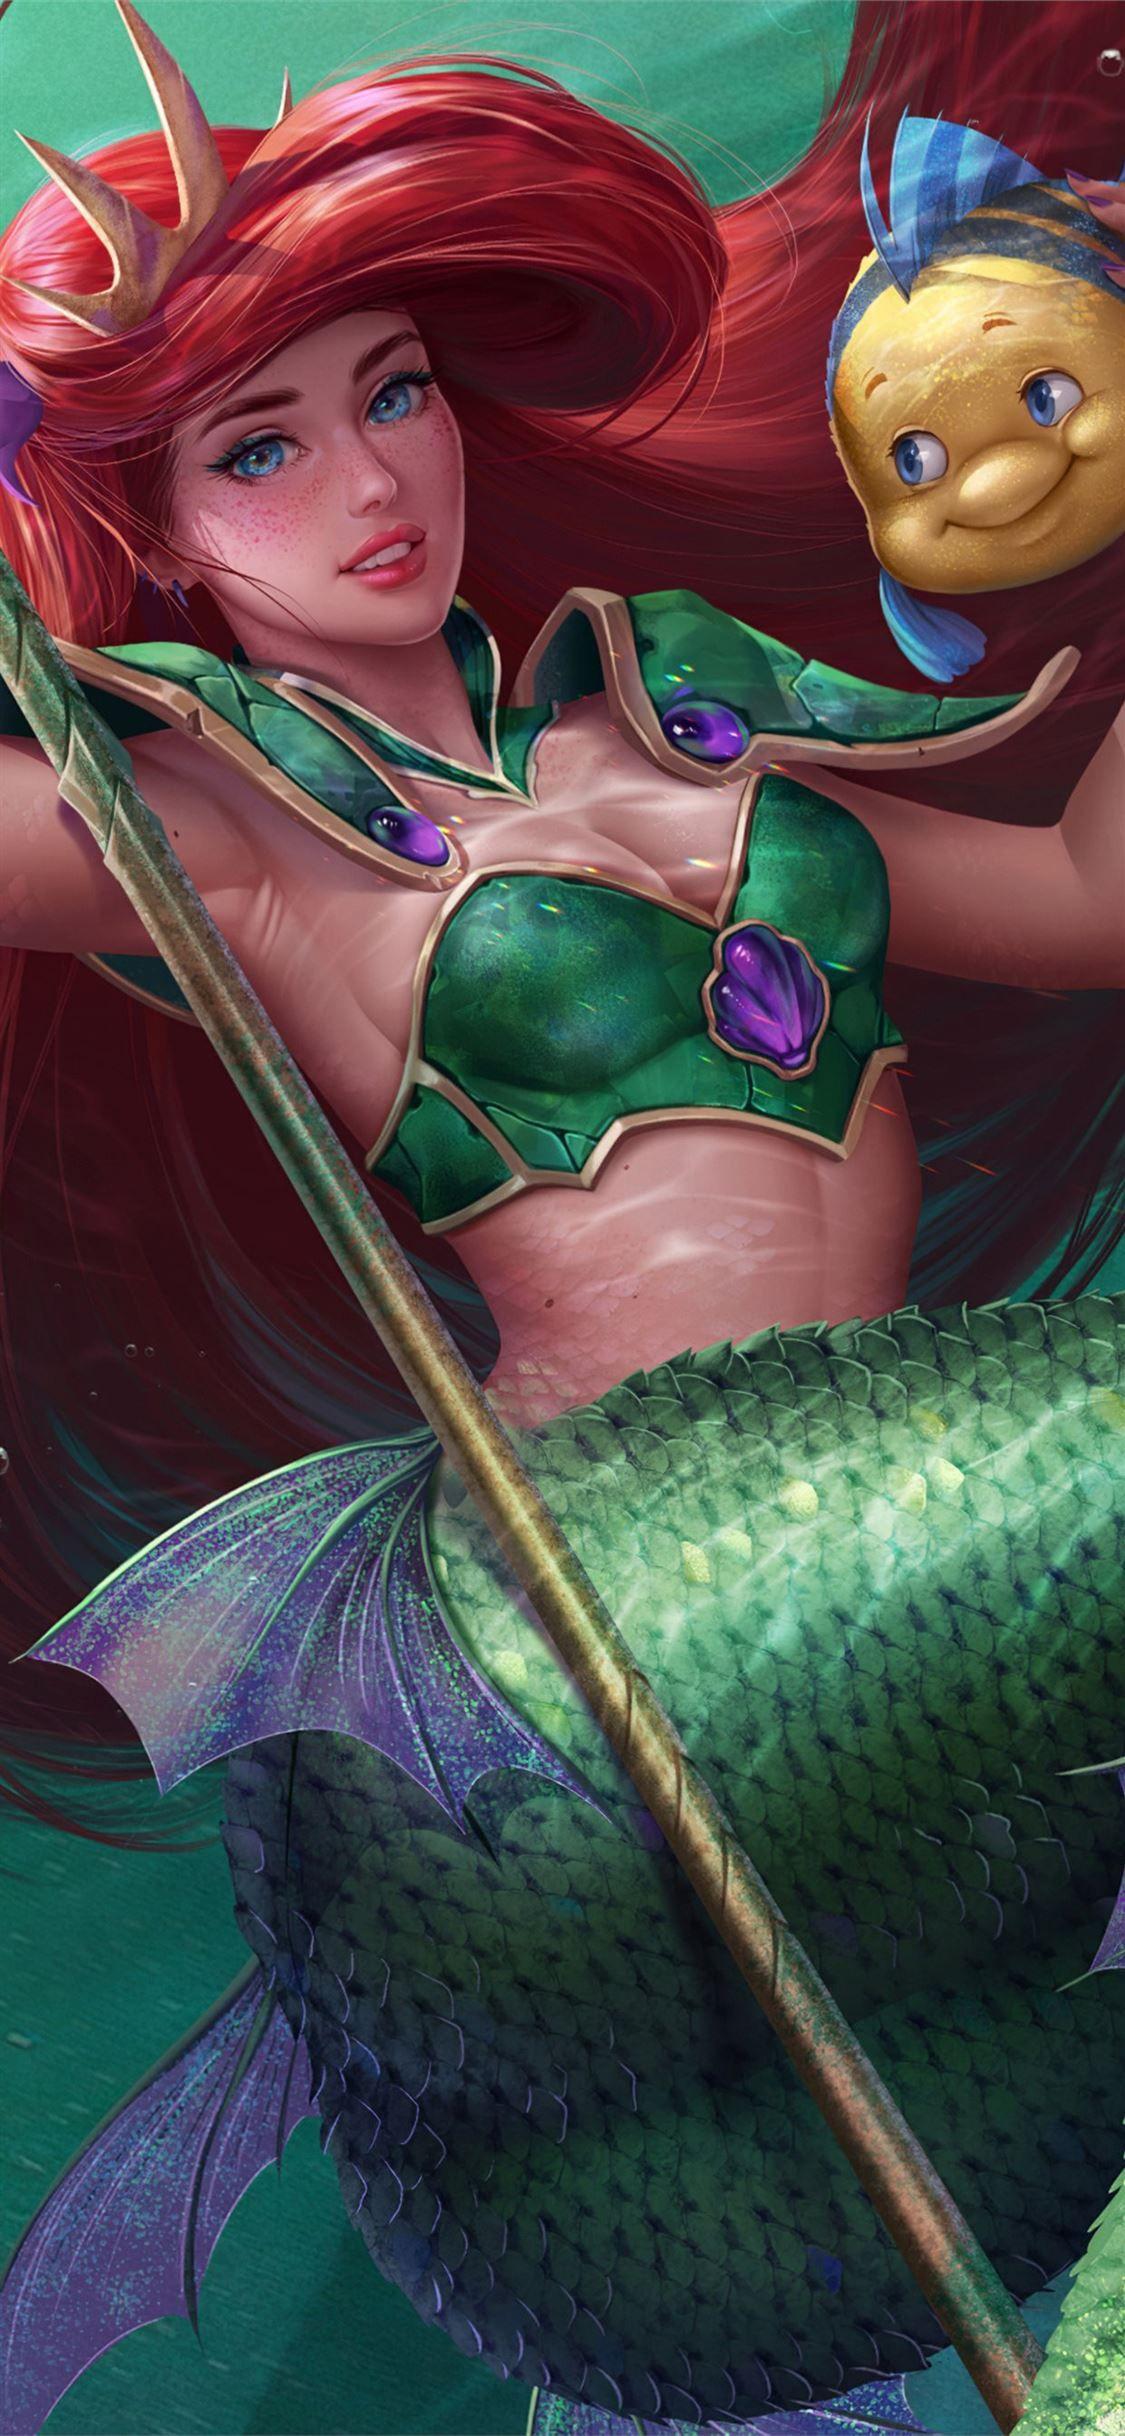 Little Mermaid Fish 4k Movies Animatedmovies 4k Mermaid Deviantart Iphone11wallpaper Mermaid Wallpapers Mermaid Background Little Mermaid Wallpaper Anime mermaid iphone wallpaper